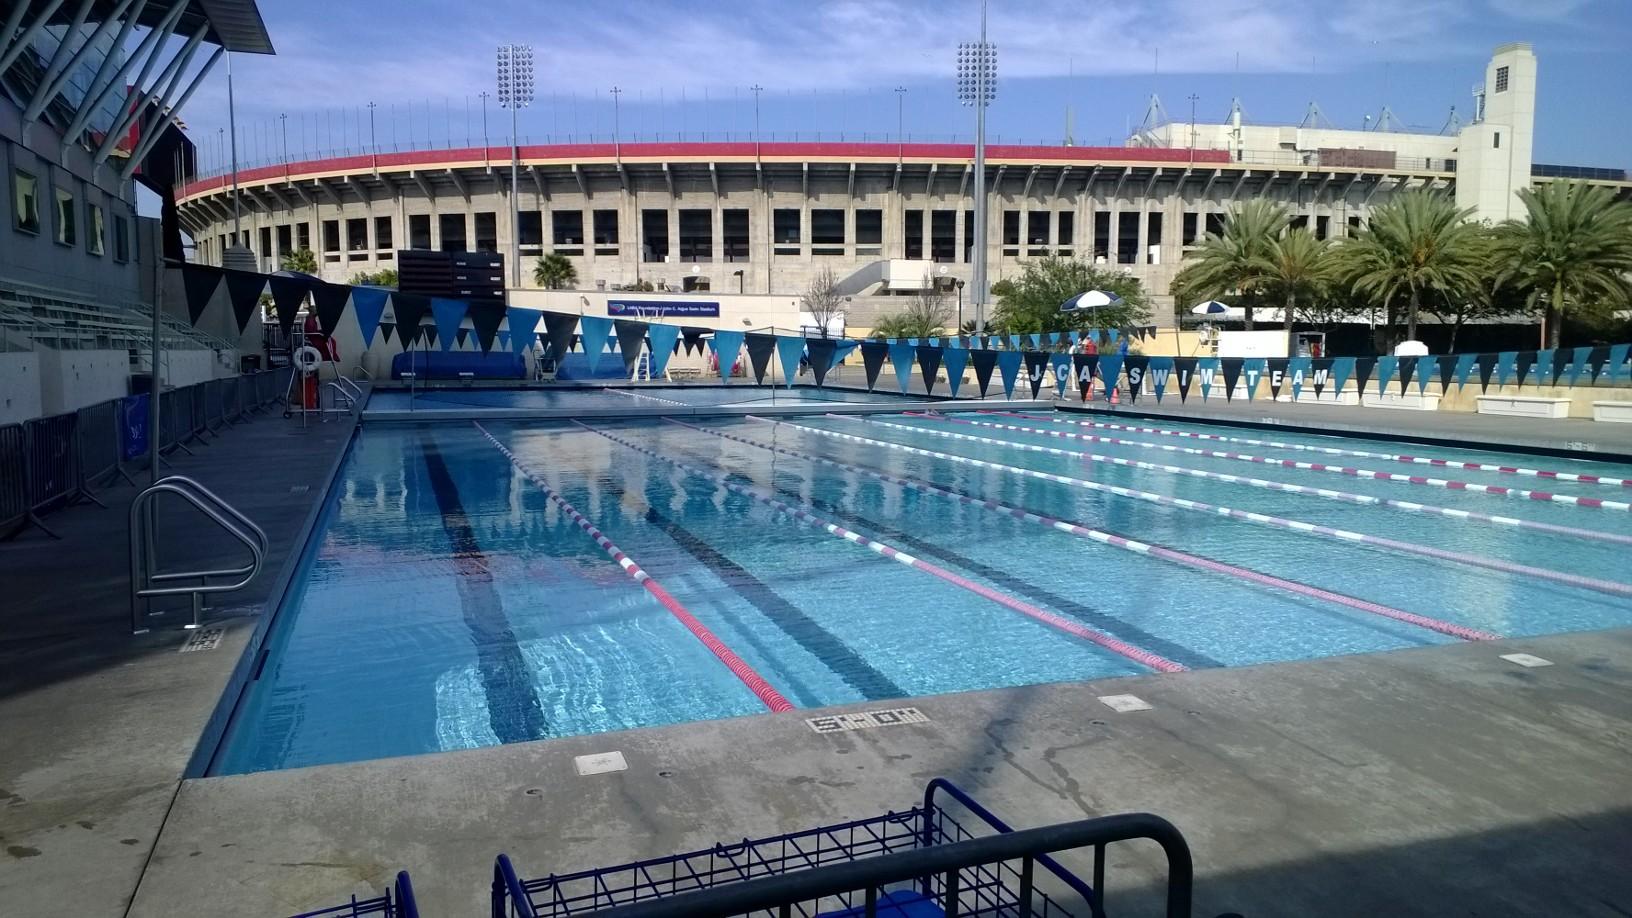 0156 - LA Swim Stadium (1932 Olympics)